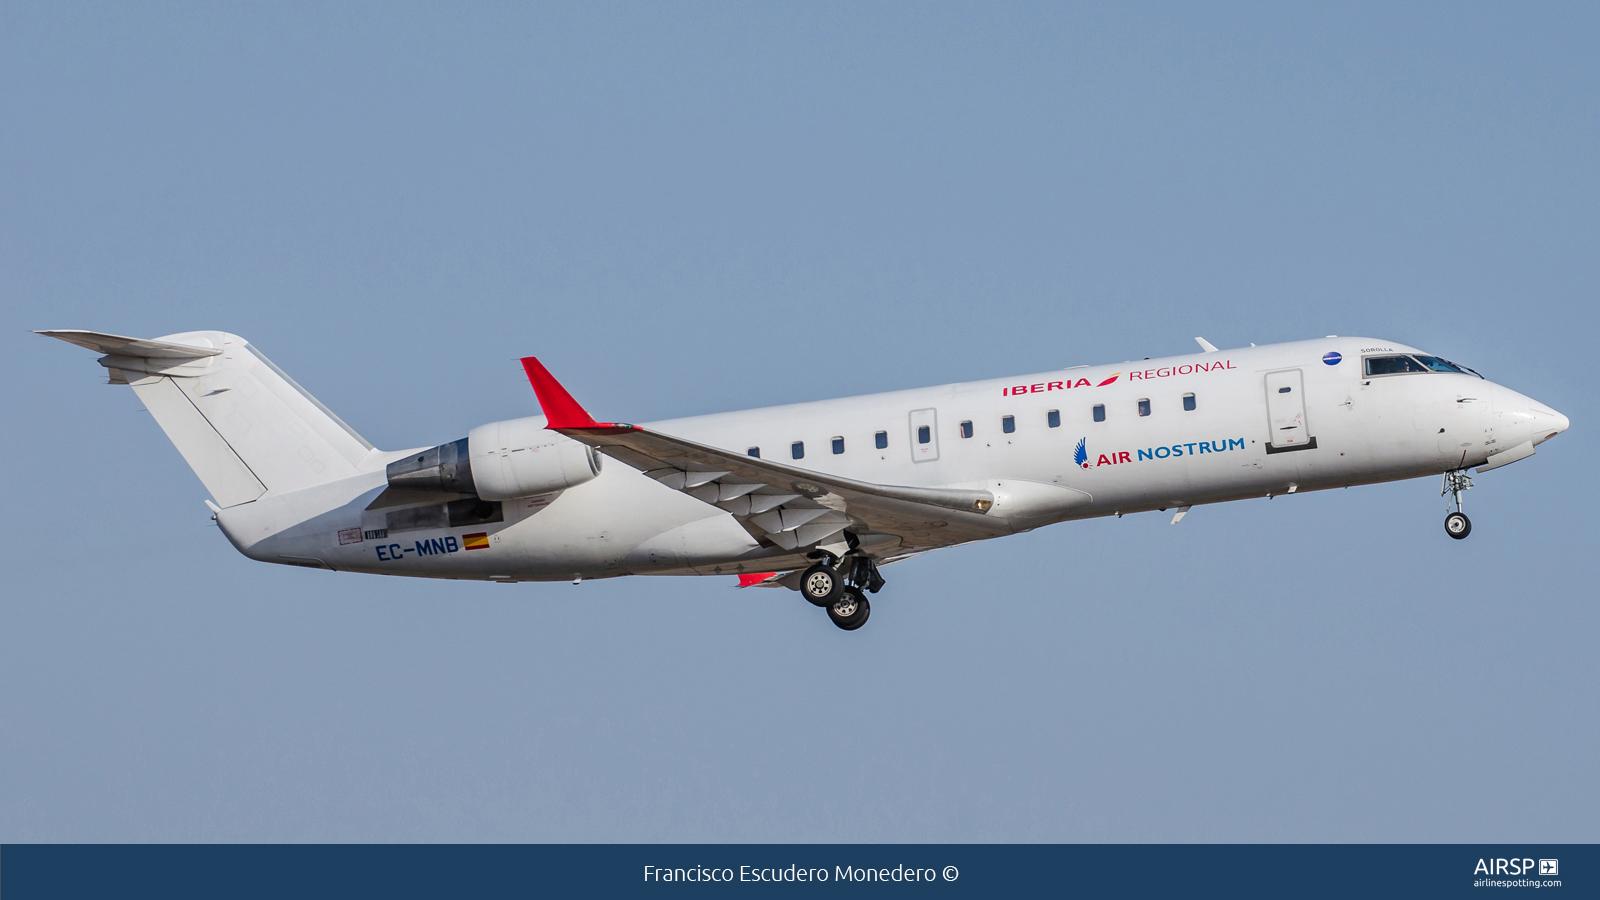 Air Nostrum Iberia Regional  Mitsubishi CRJ-200  EC-MNB